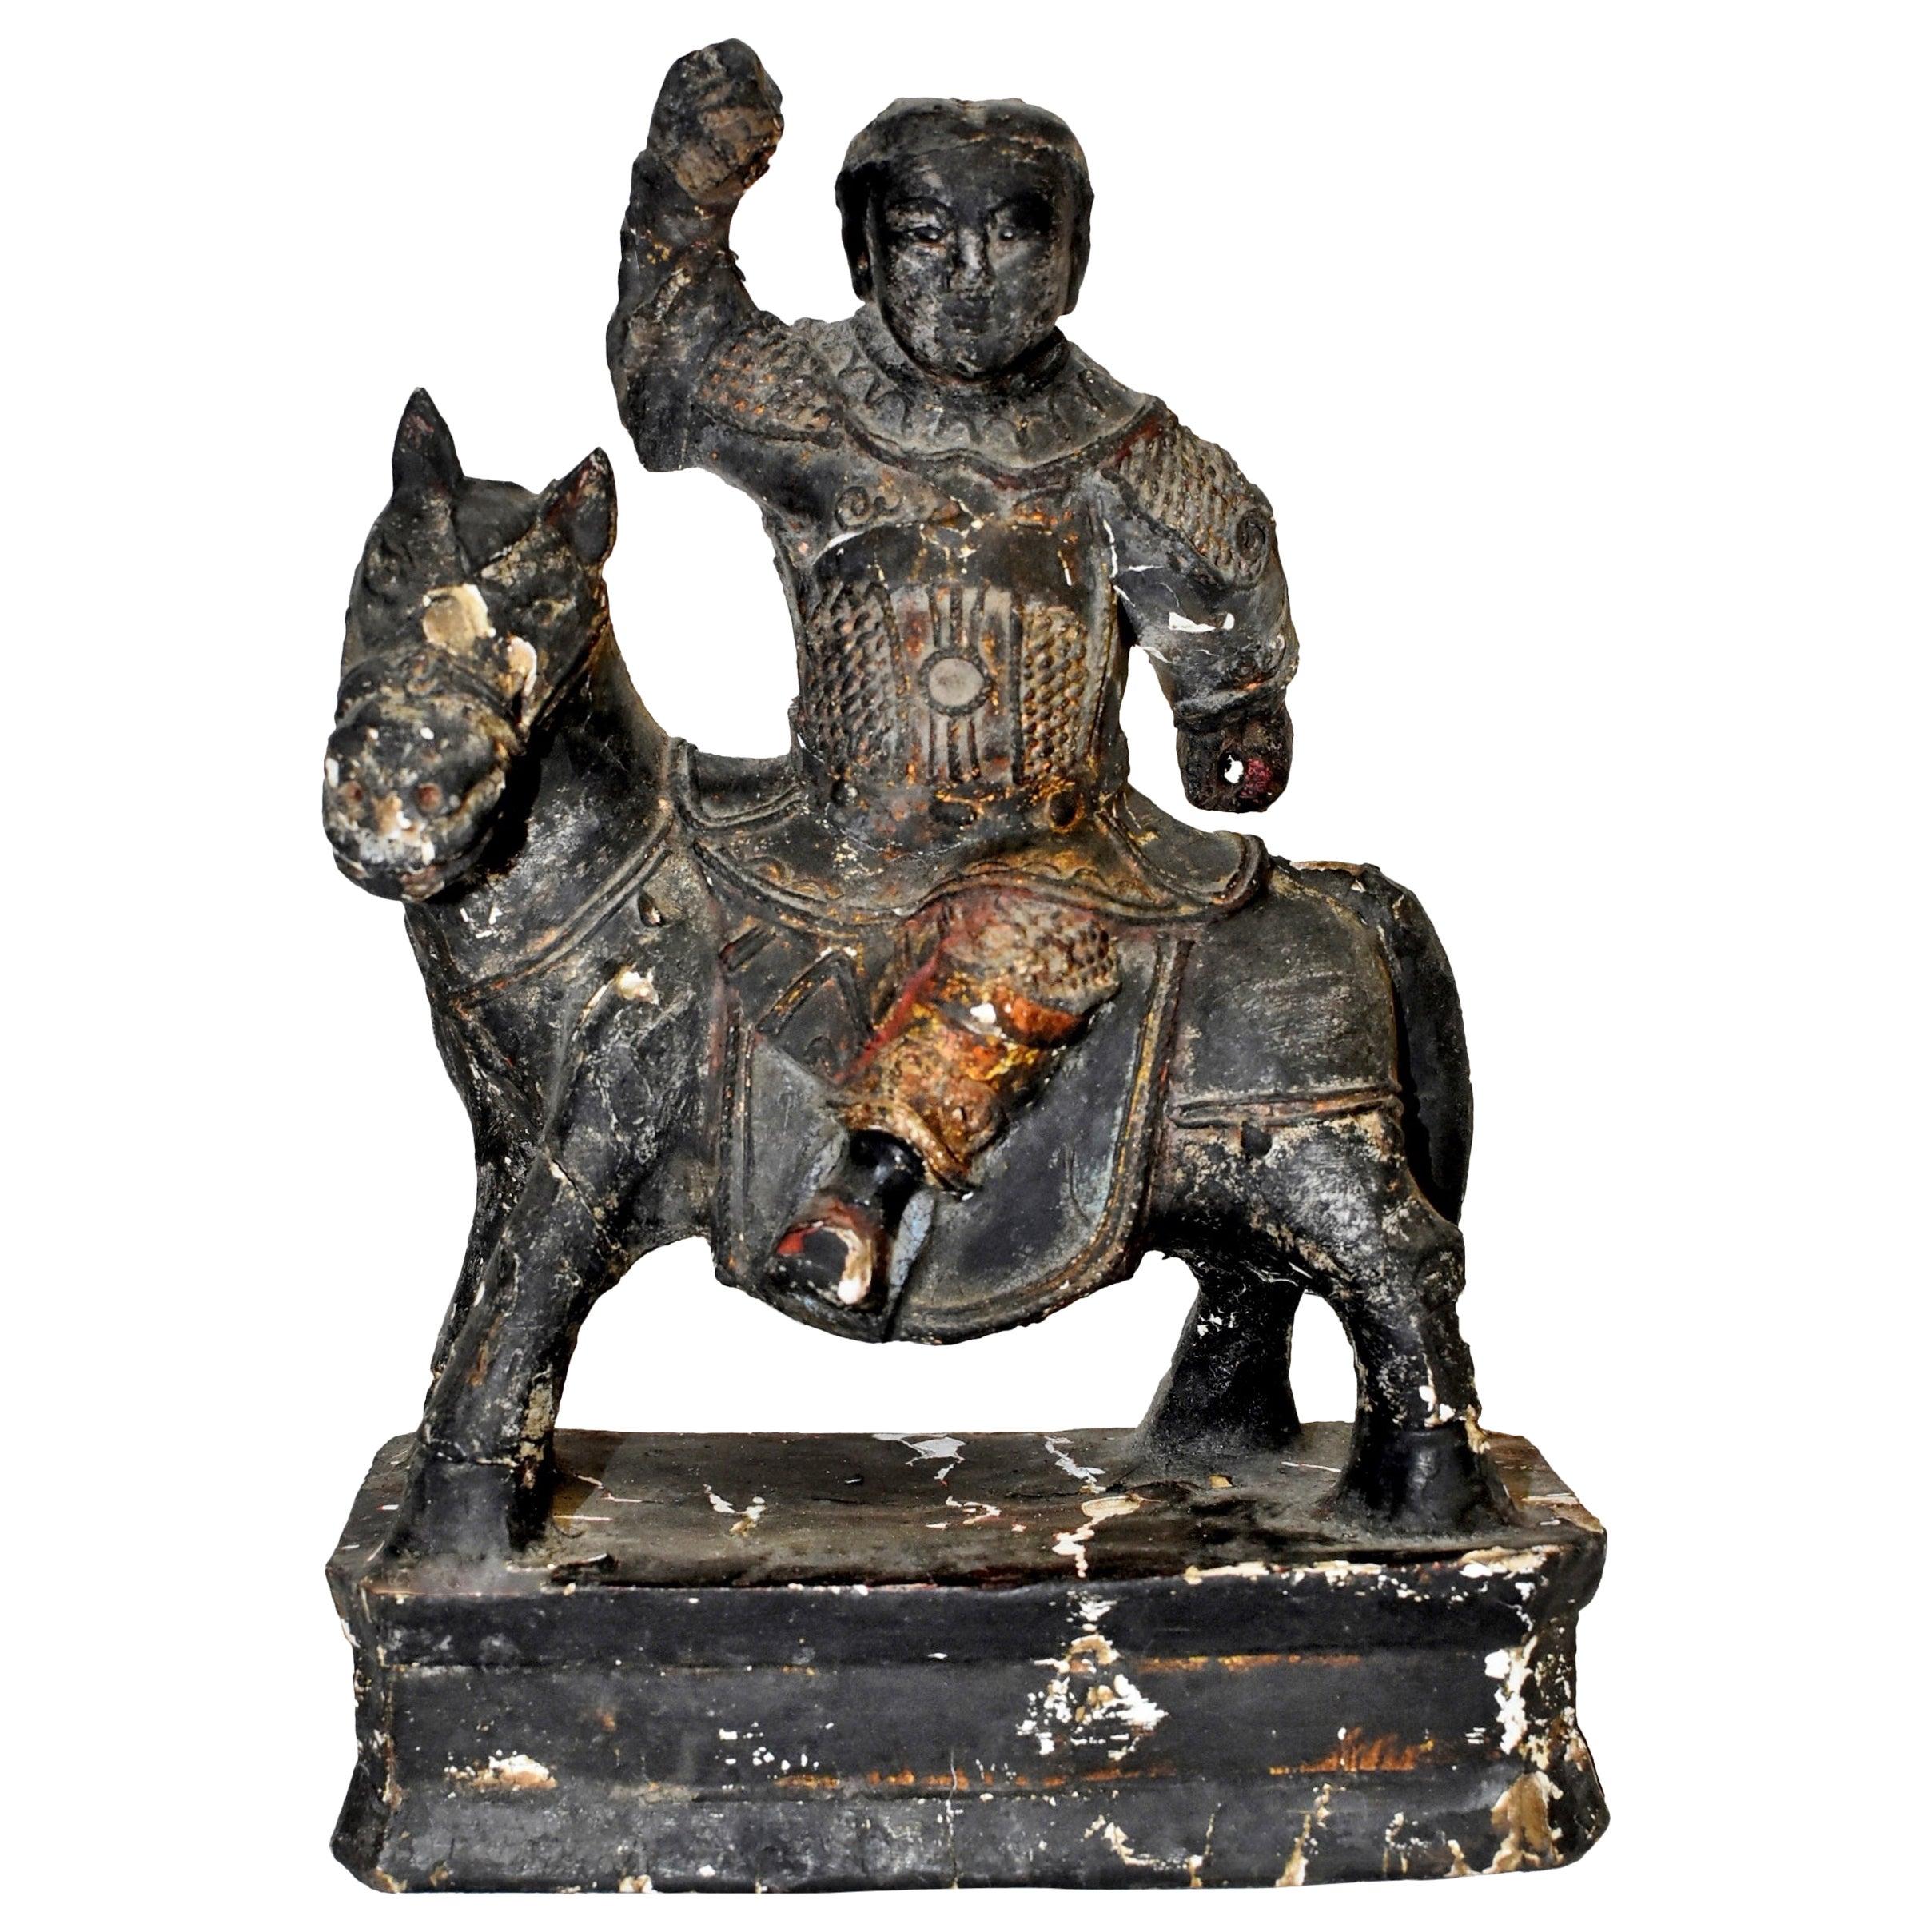 Ming Dynasty Warrior Statue